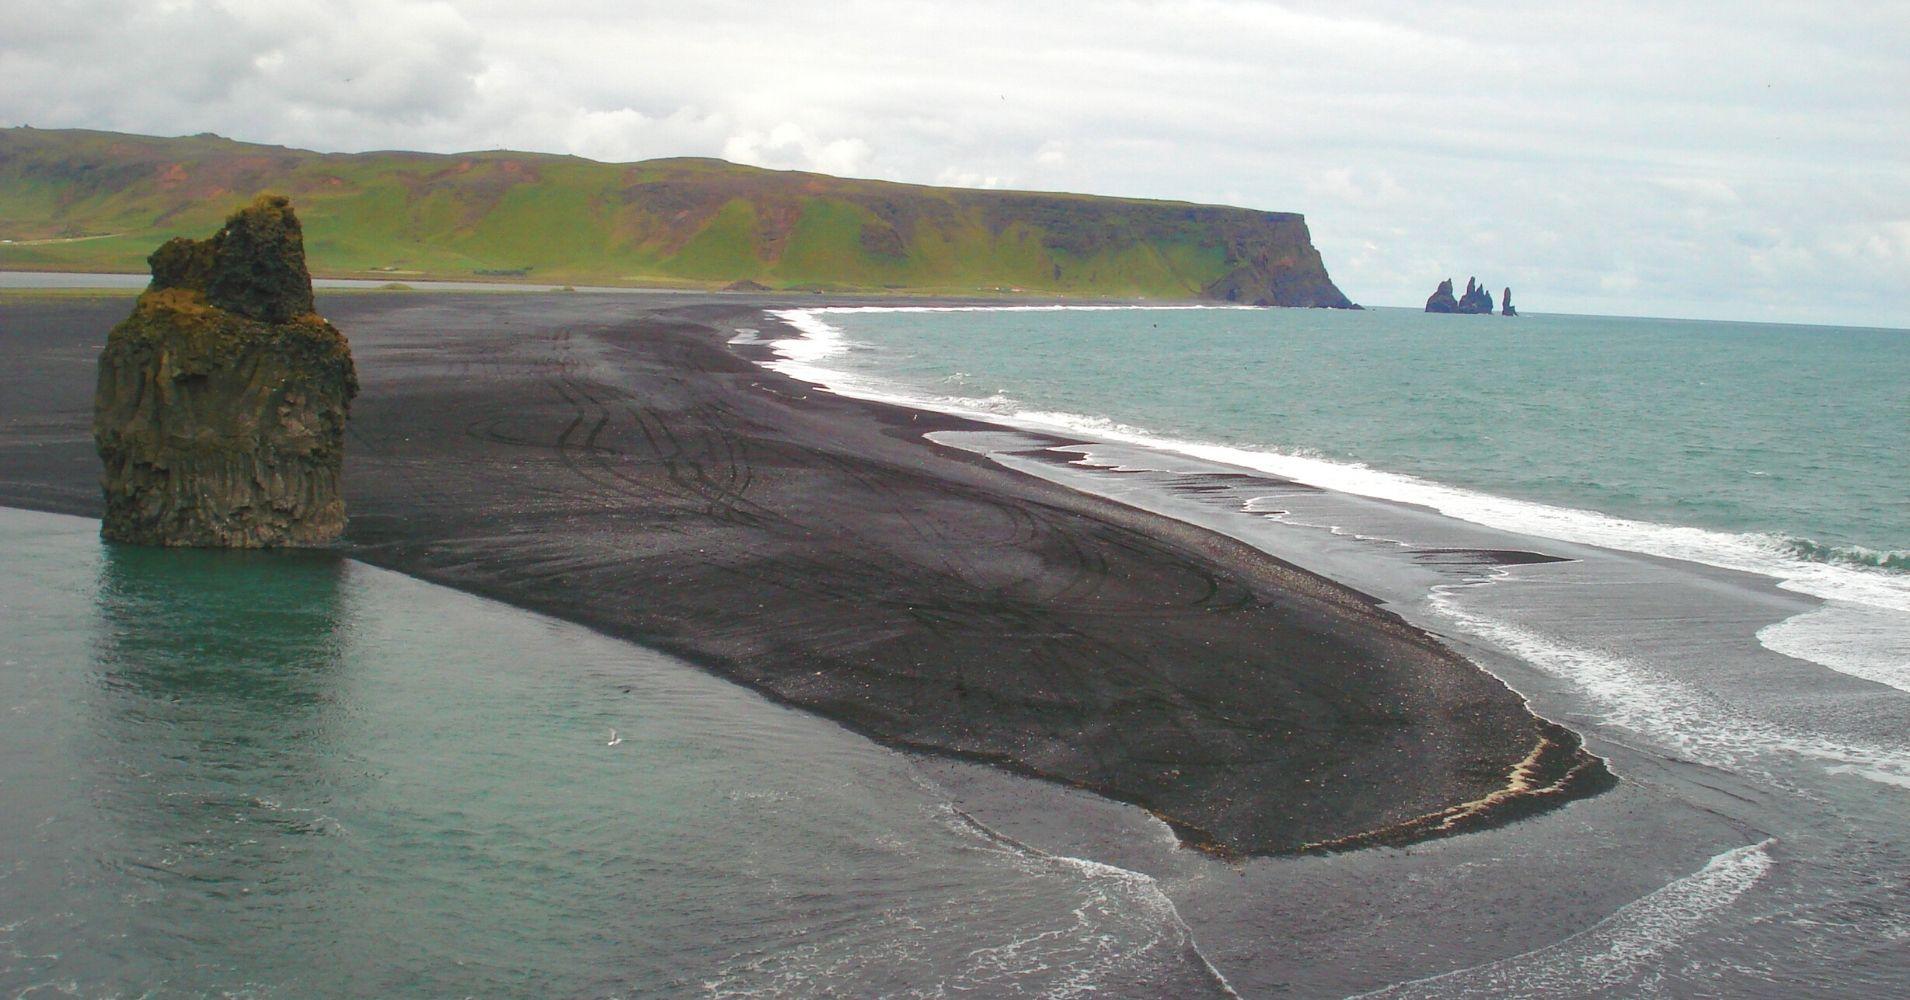 Montana Reynisfjall, Road Trip Iceland.